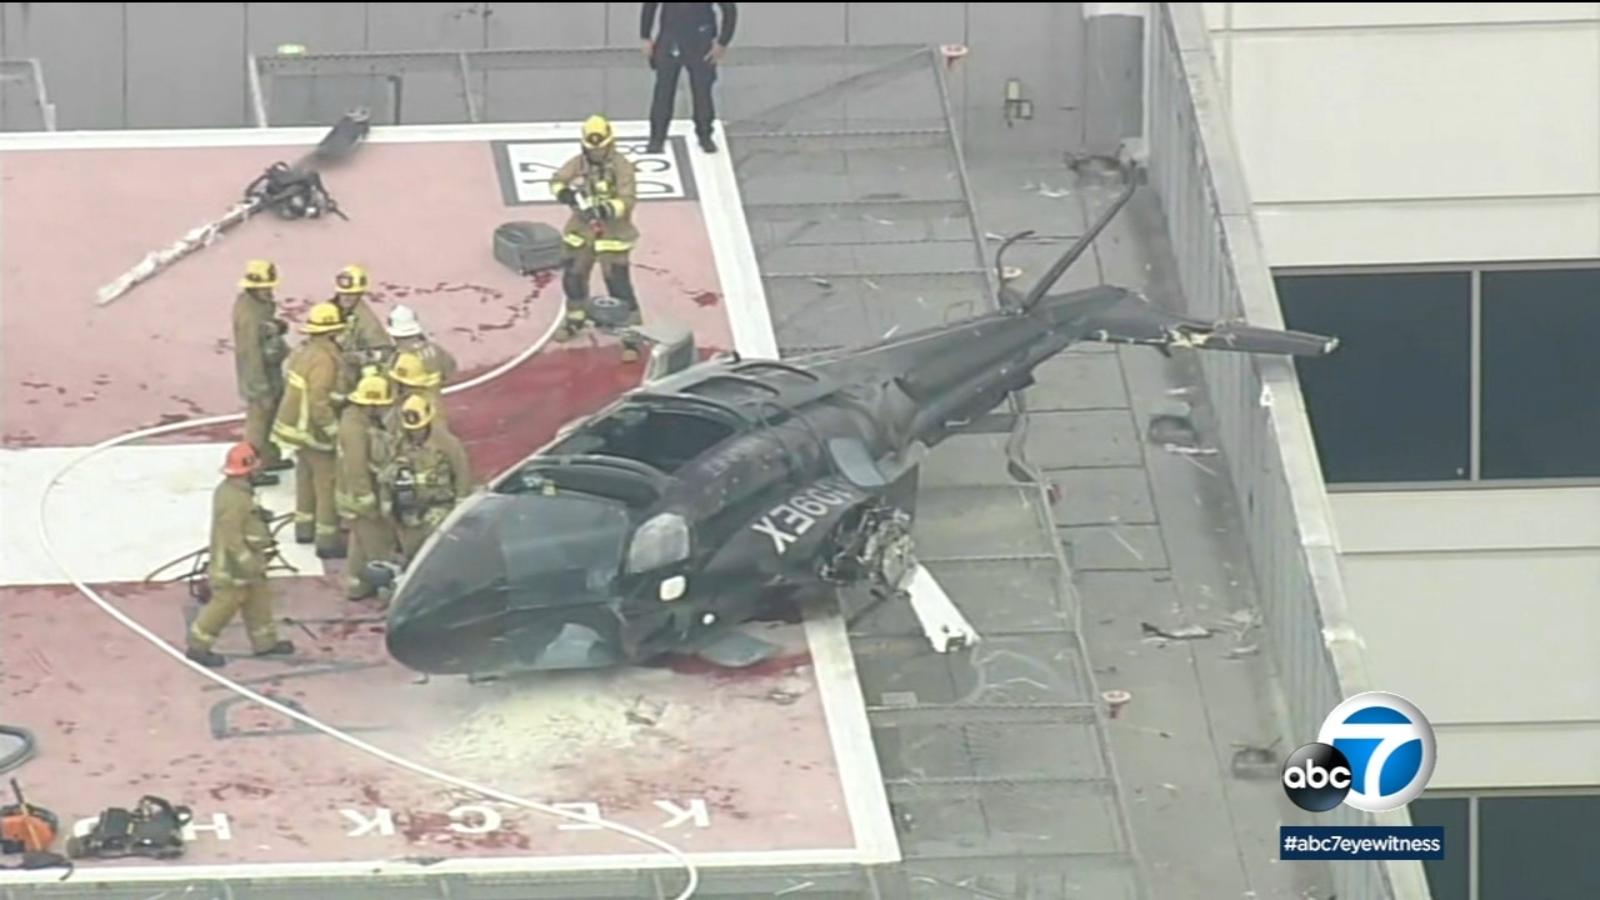 7720602 110620 kabc 7pm chopper crash vid jpg?w=1600.